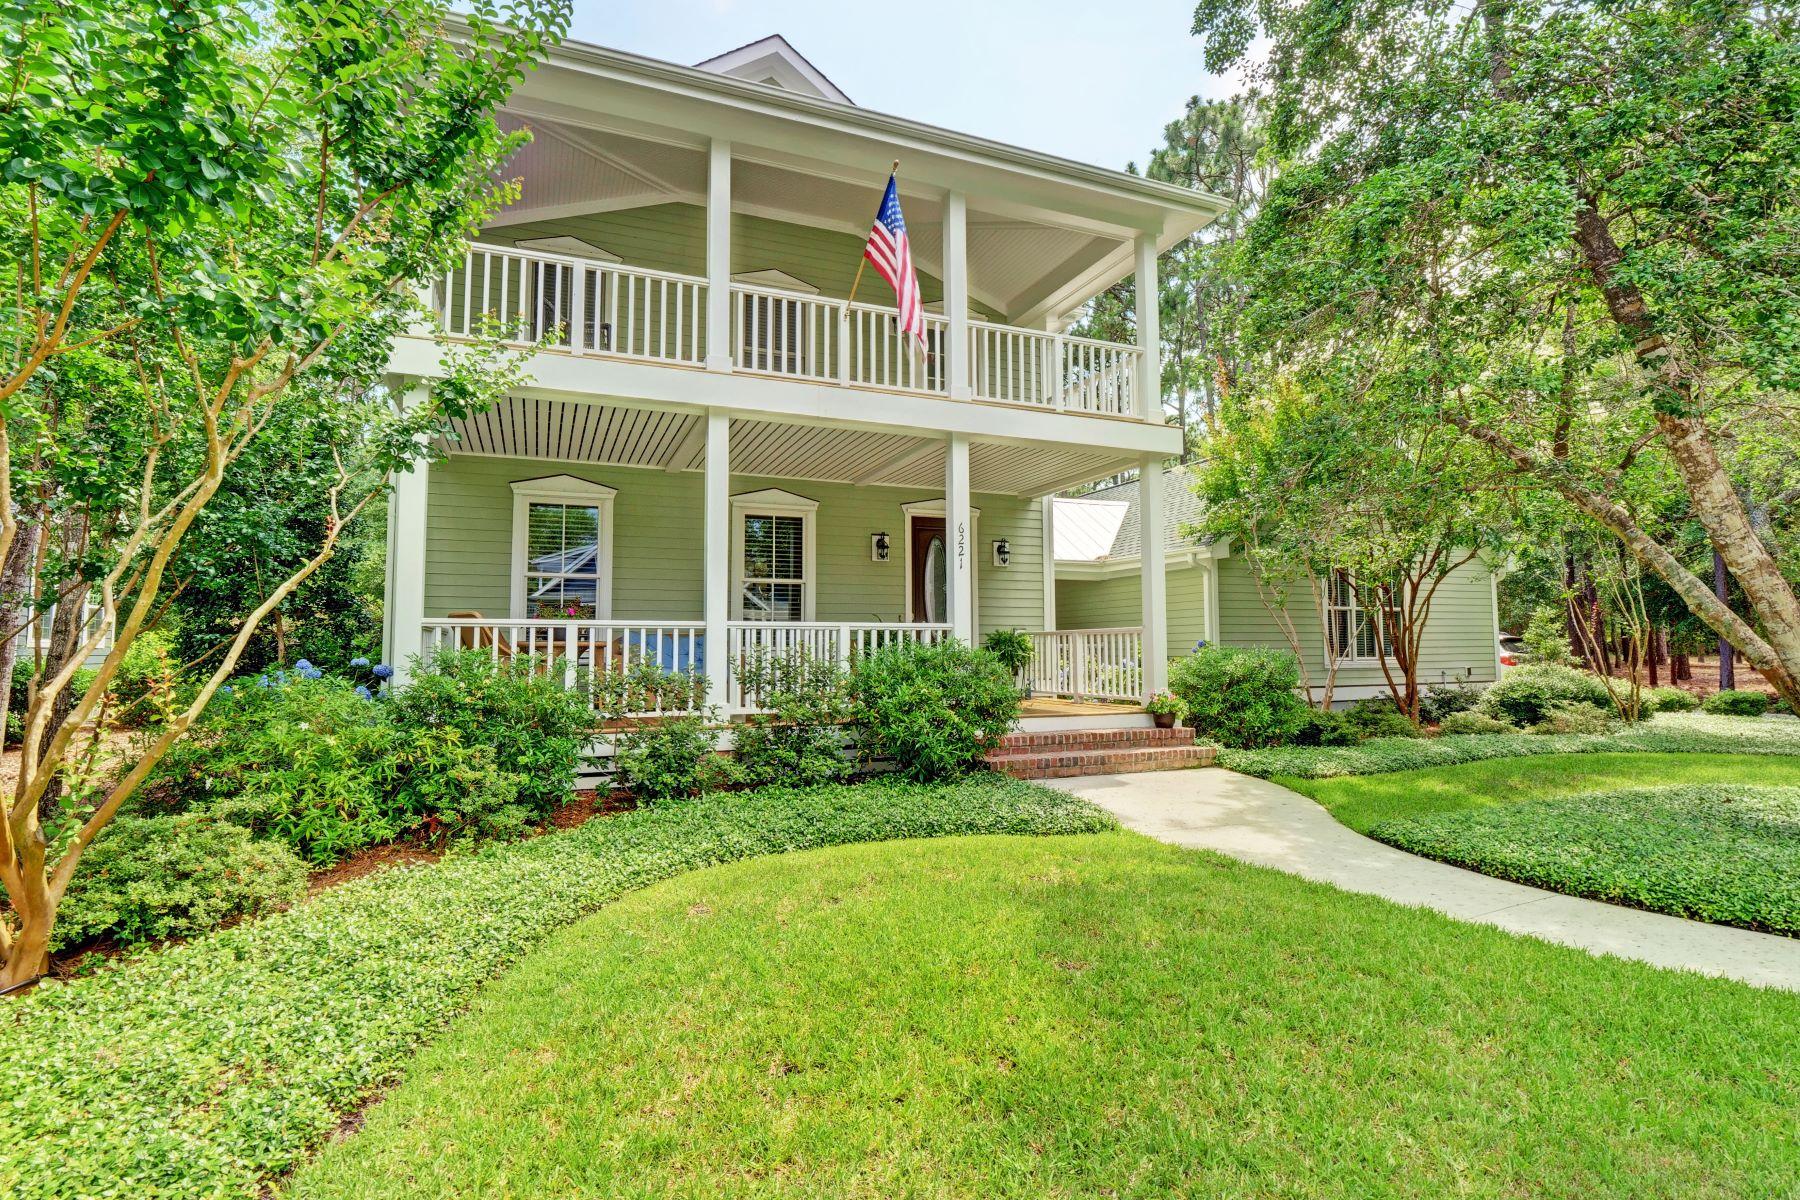 Single Family Home for Active at Custom Home with Serene Natural Environment 6221 Navigator Way Southport, North Carolina 28461 United States